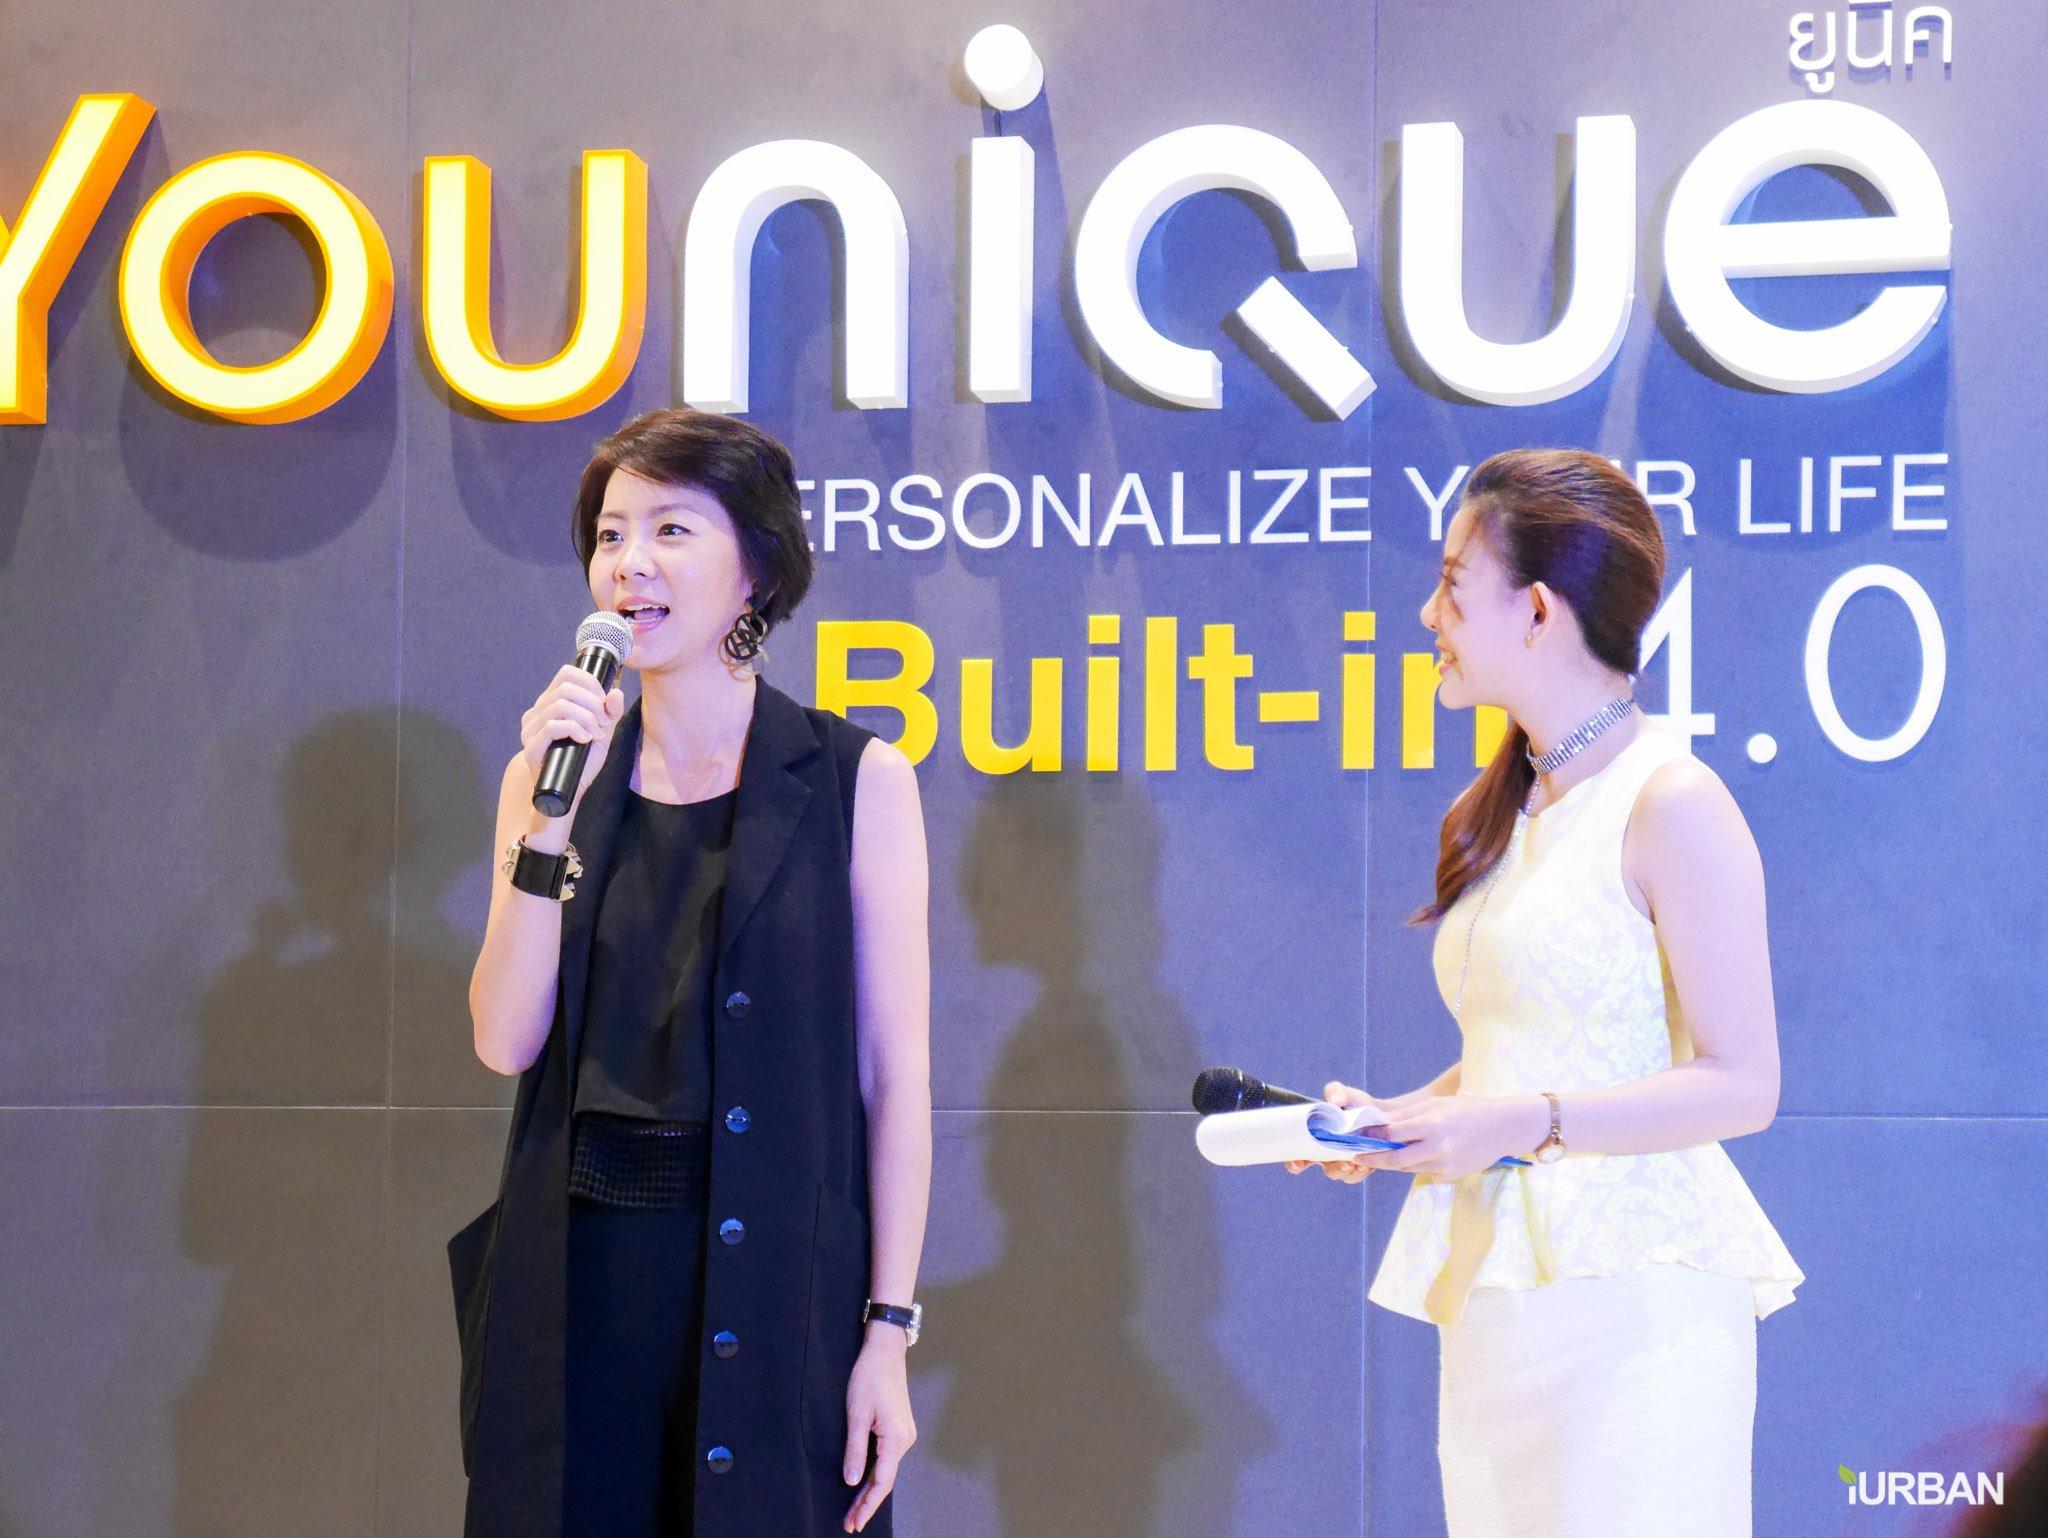 Younique เทคโนโลยีบิวท์อิน 4.0 ครั้งแรกในไทย มีเป็นล้านดีไซน์ รู้ราคาใน 1 นาที โดย Index Livingmall 44 - Built-in